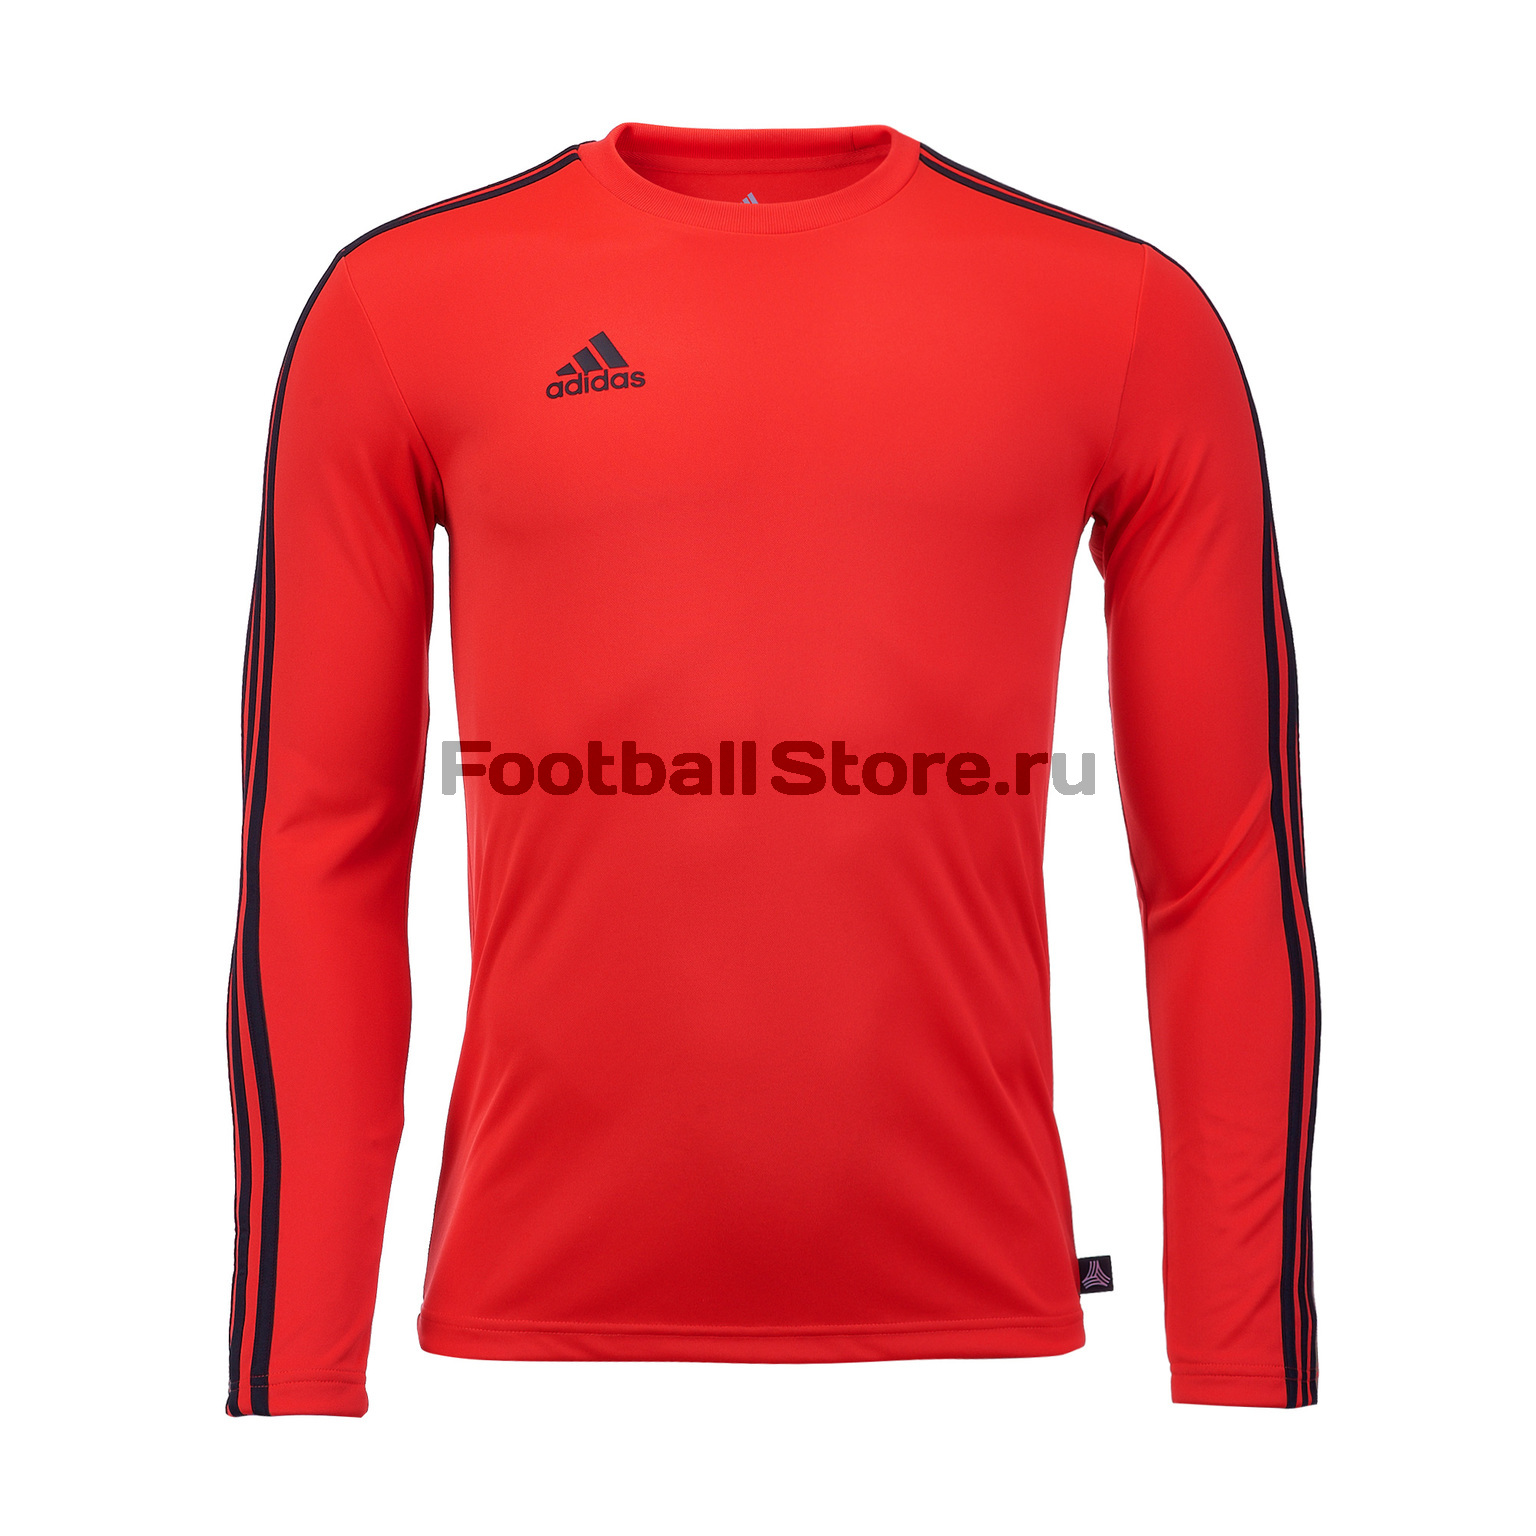 Футболка с длинным рукавом Adidas Tango Terry CZ3995 цена 2017